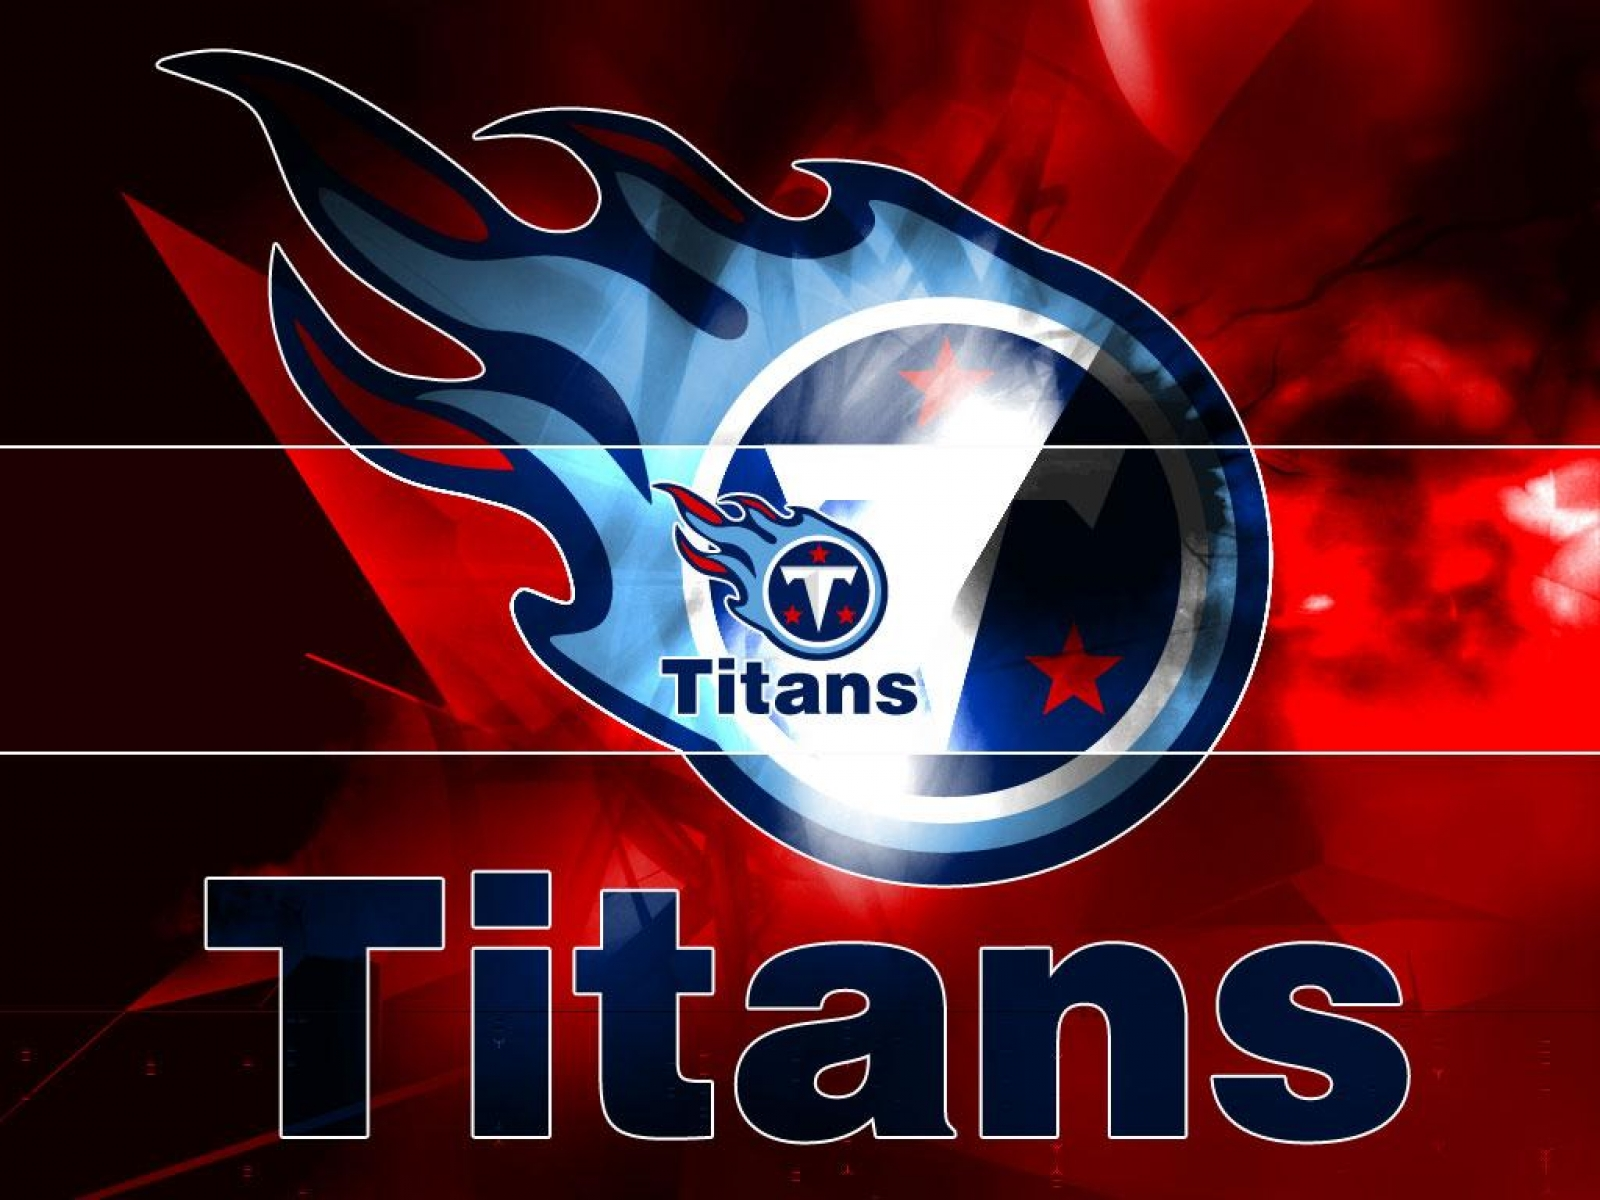 titans - photo #18